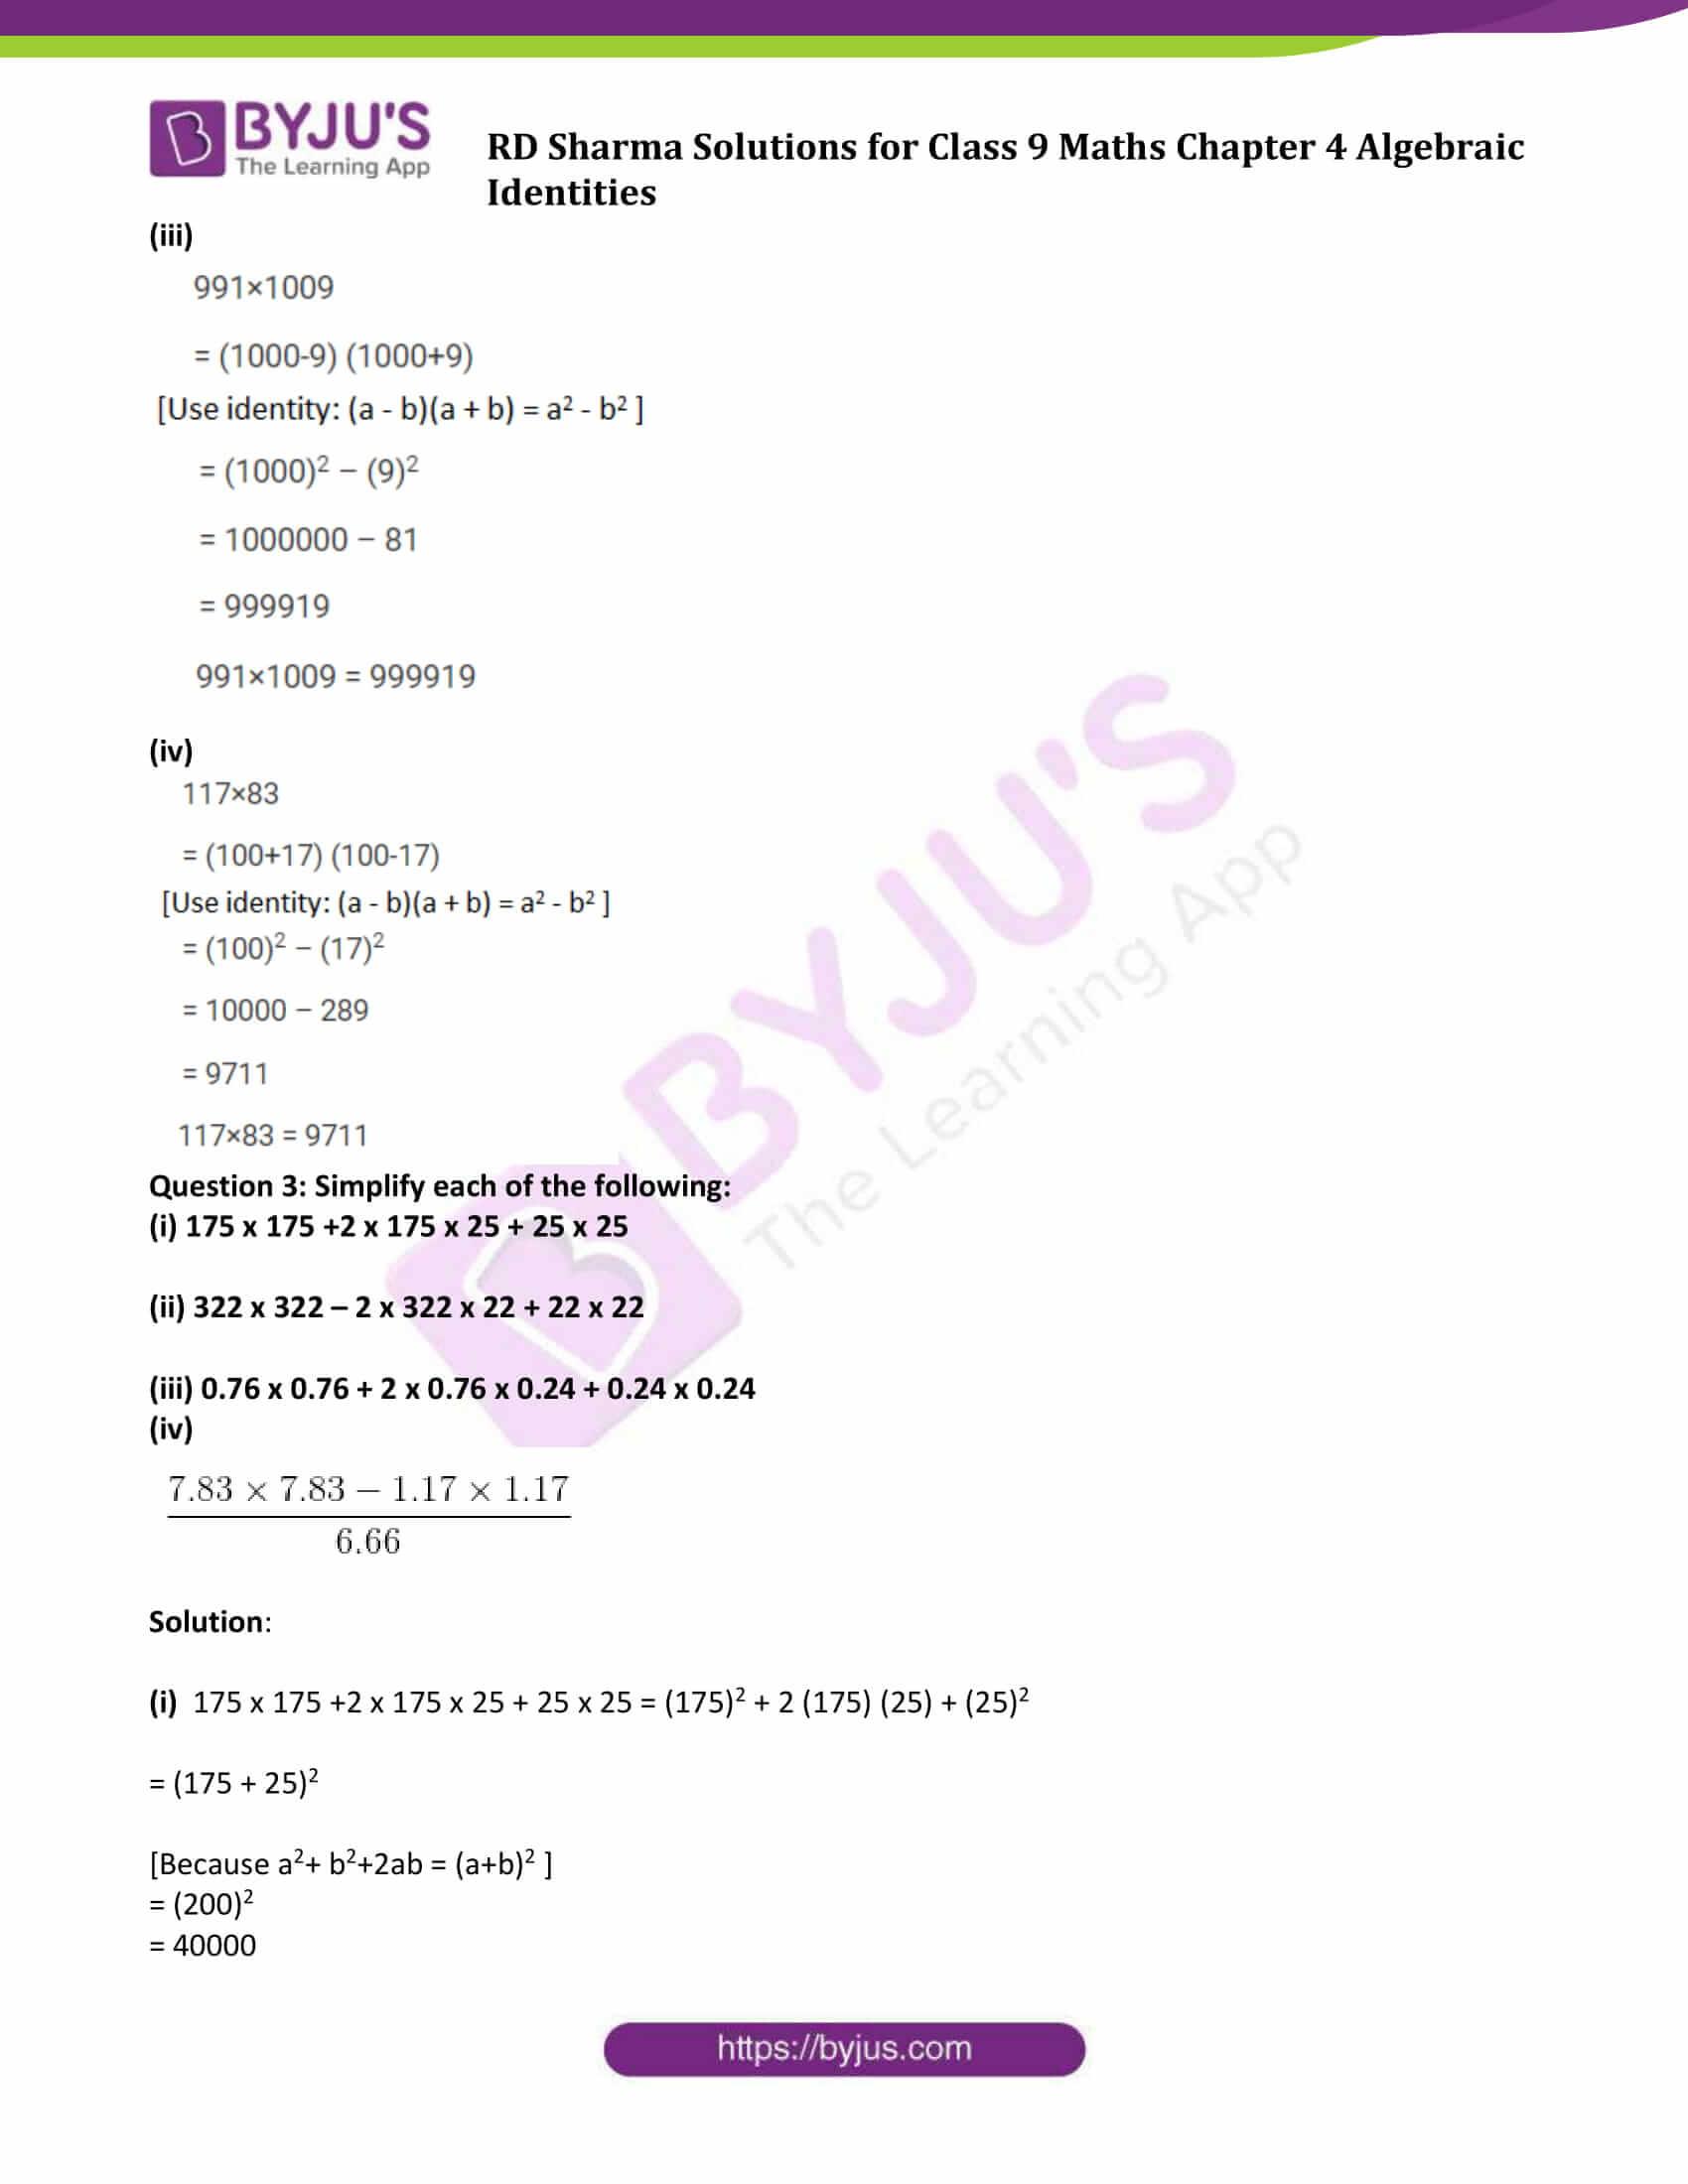 RD Sharma Solution class 9 Maths Chapter 4 Algebraic Identities 03